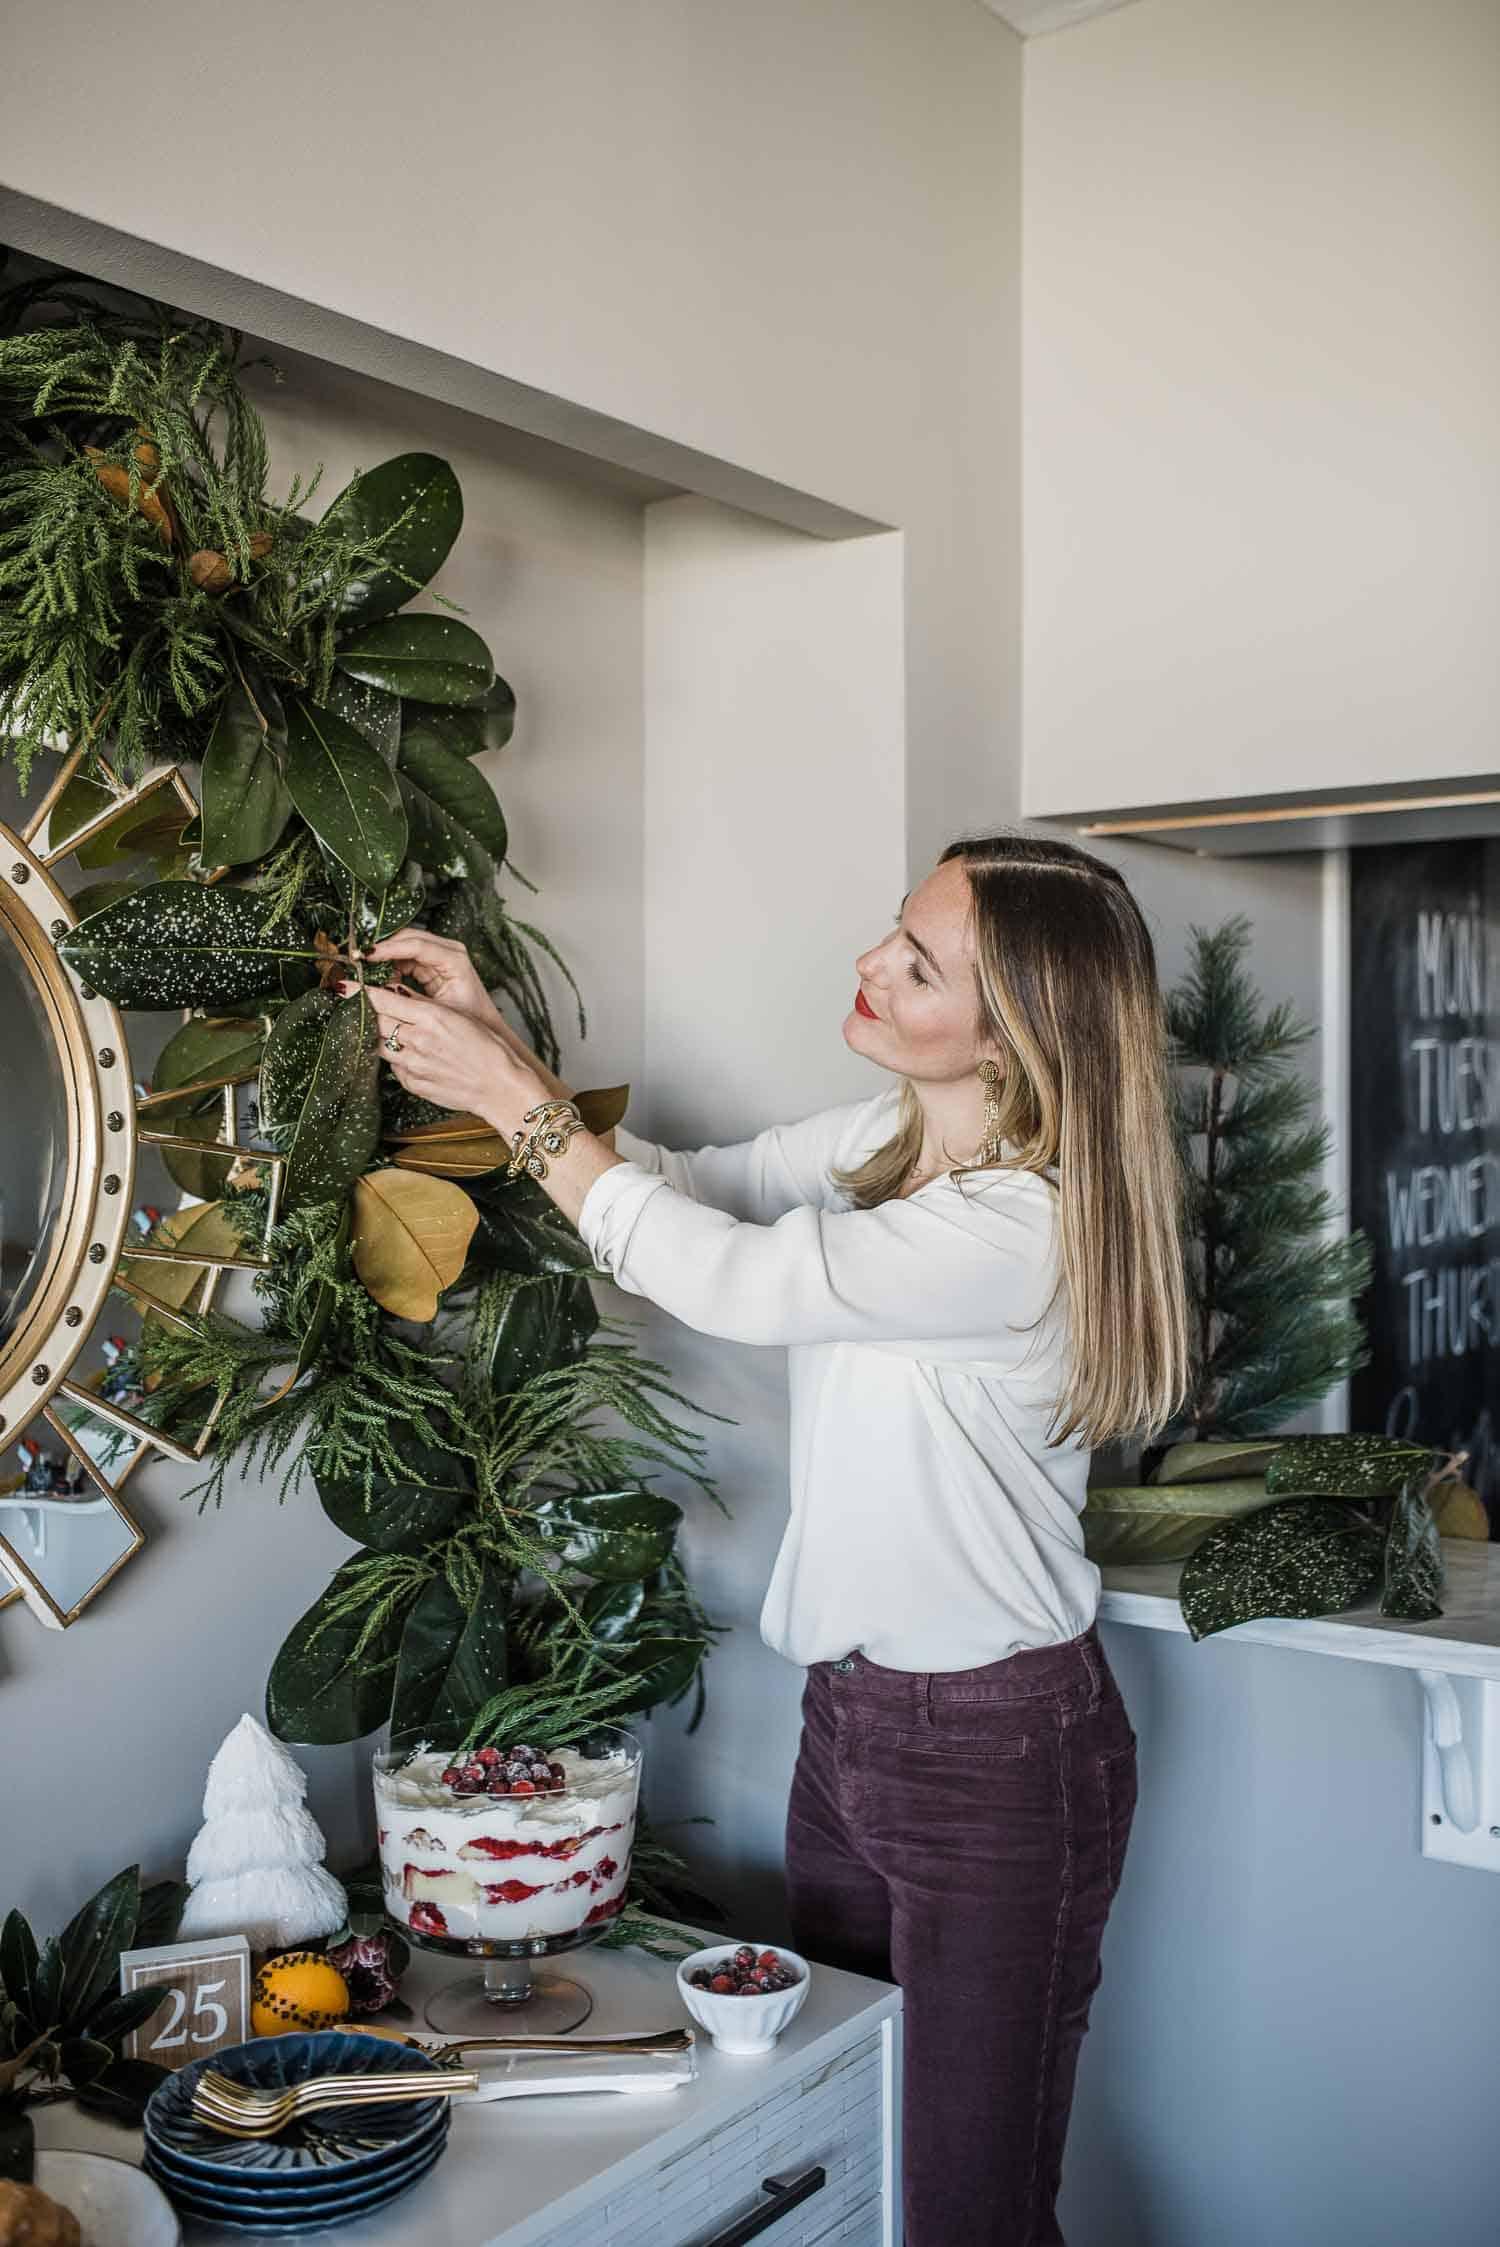 How to DIY magnolia garland